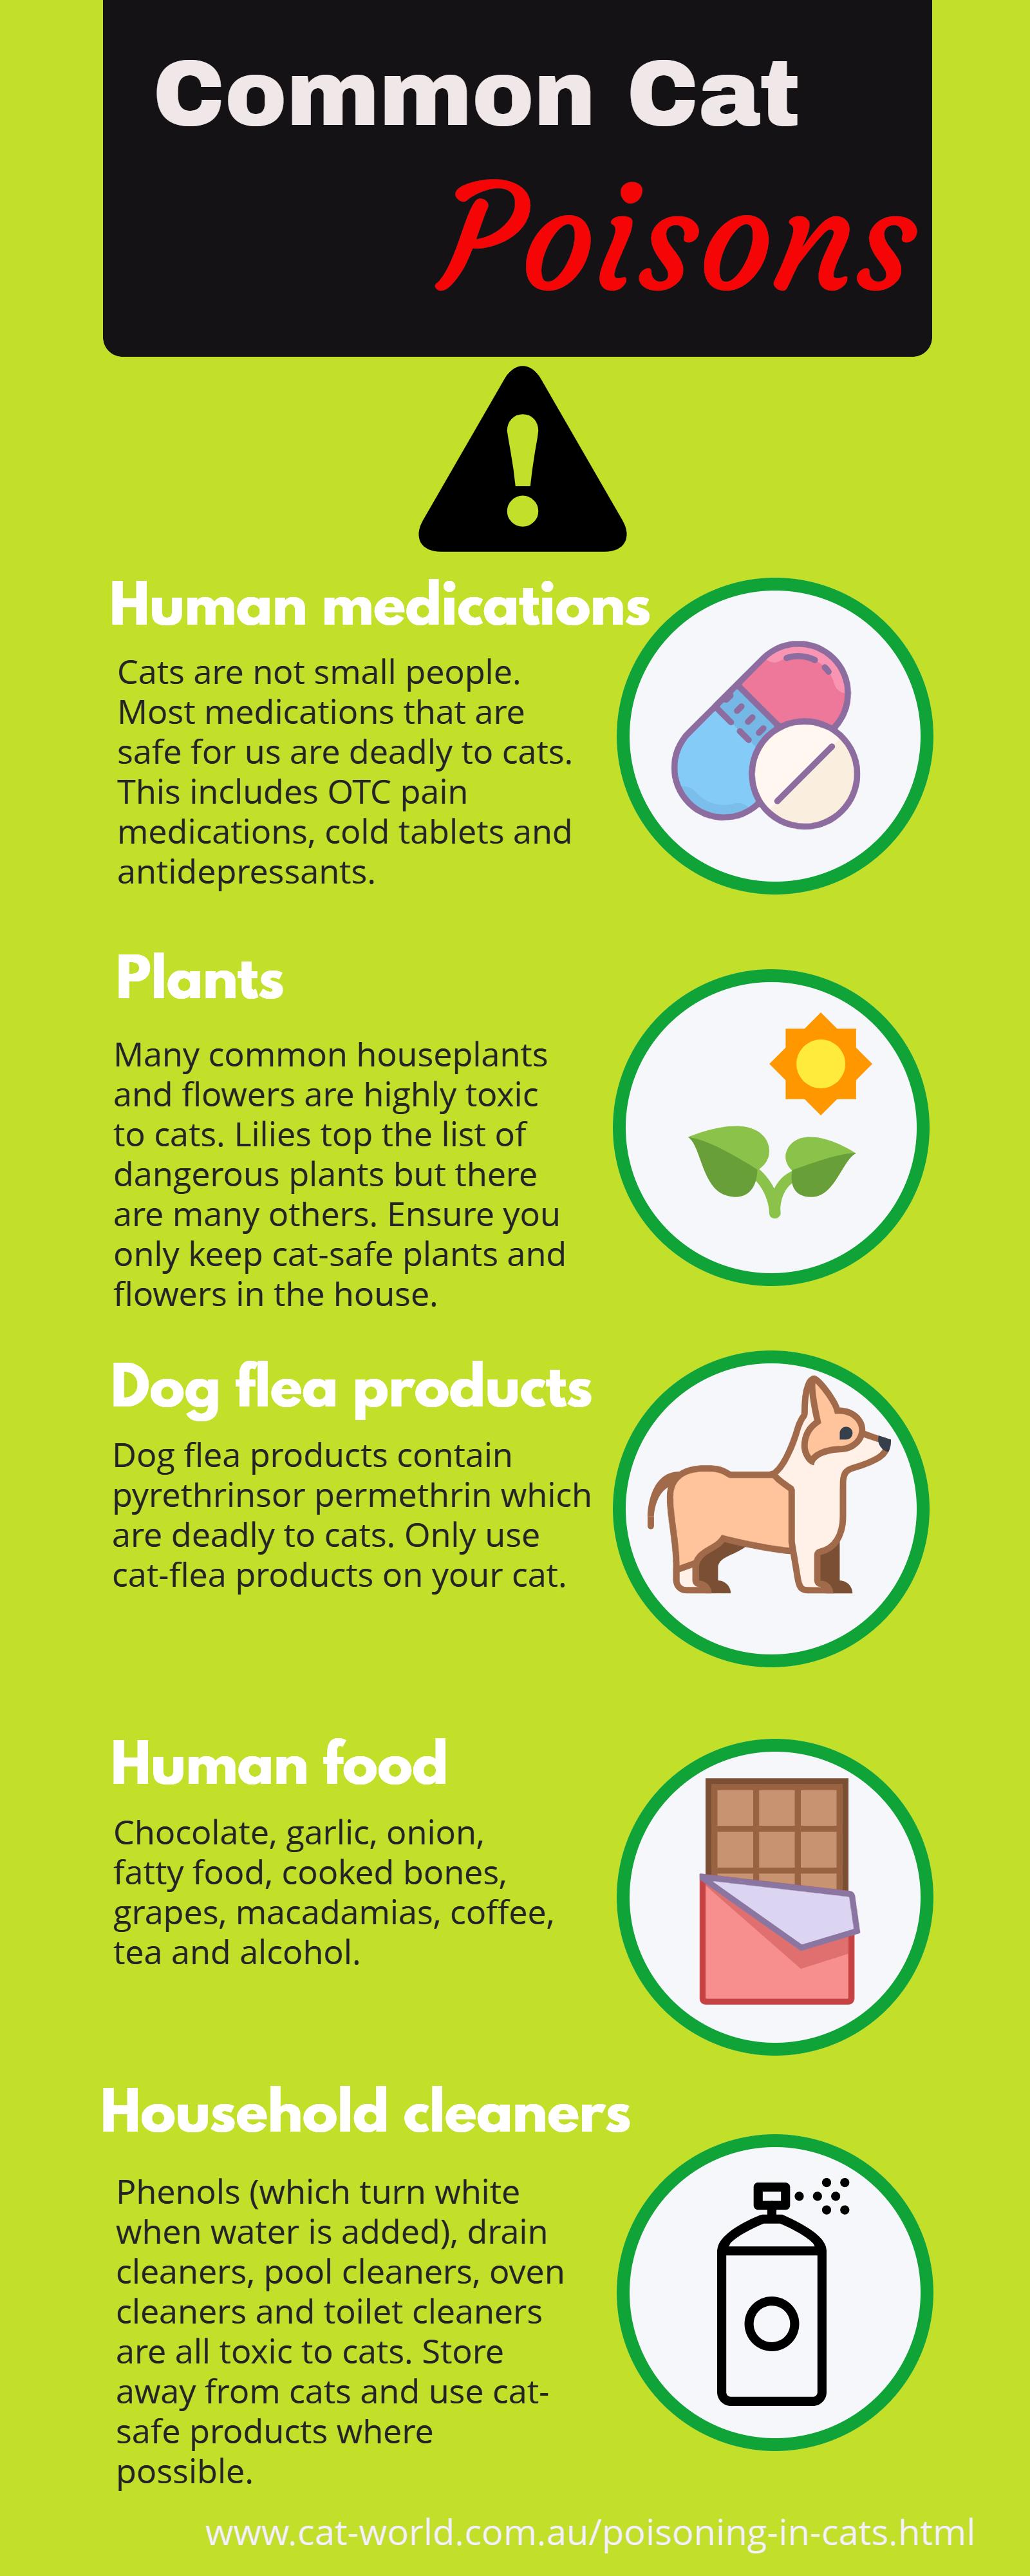 Common cat poisons